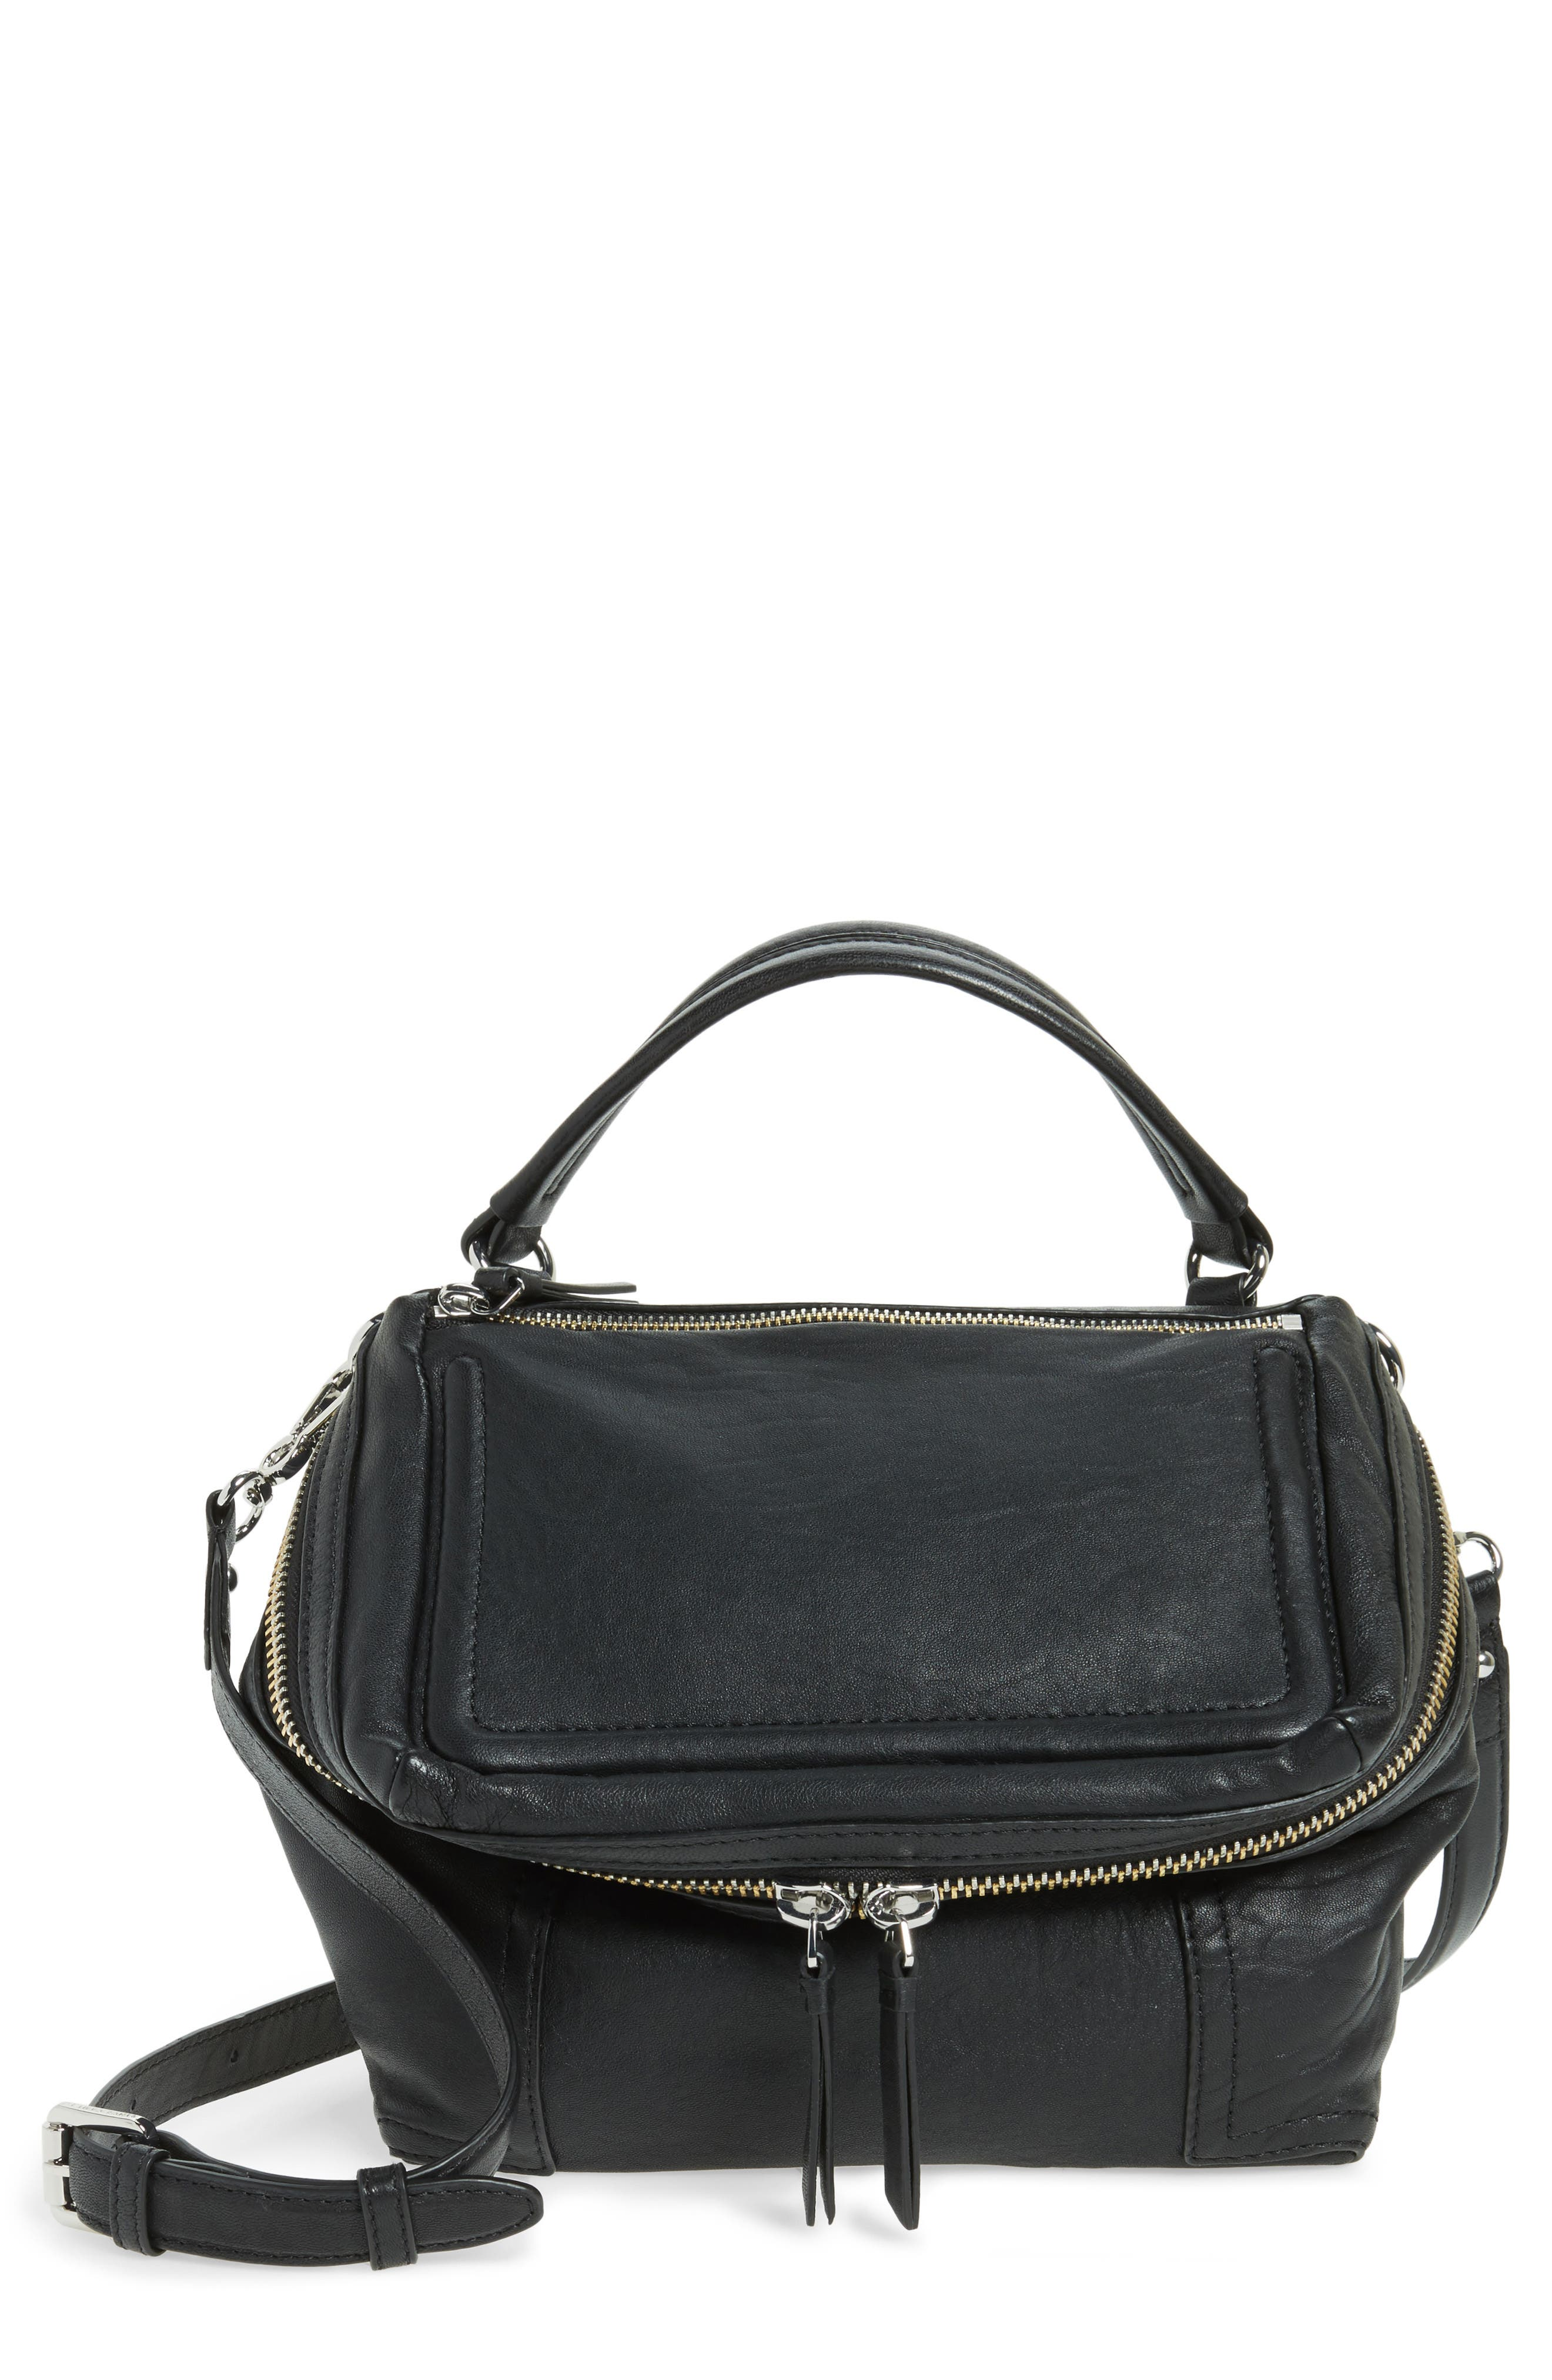 Medium Patch Leather Crossbody Bag,                         Main,                         color, 002